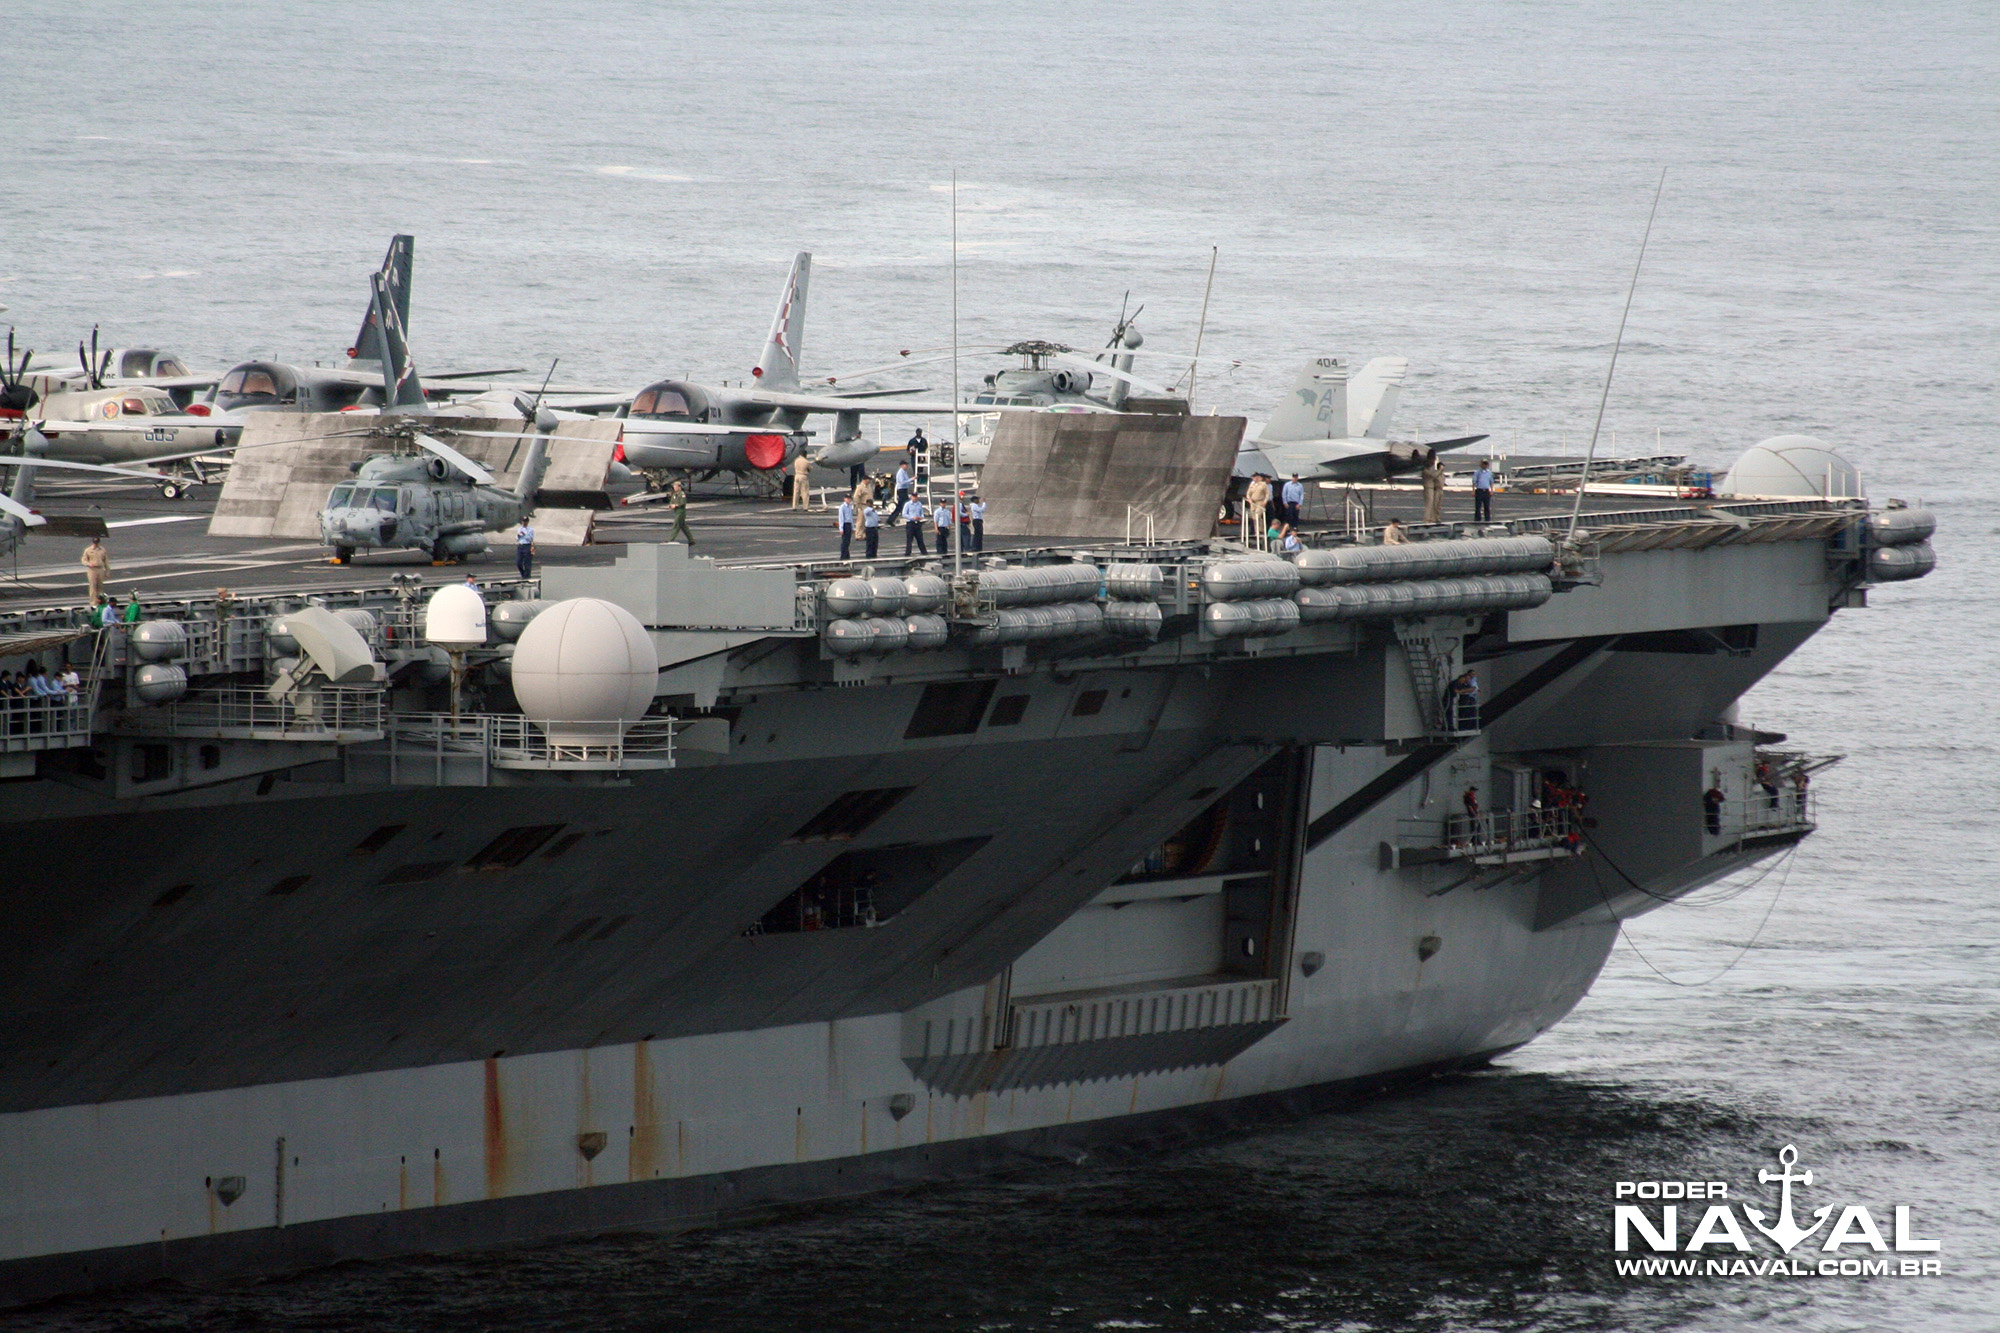 USS George Washington (CVN-73) no Rio - 2008 - 9